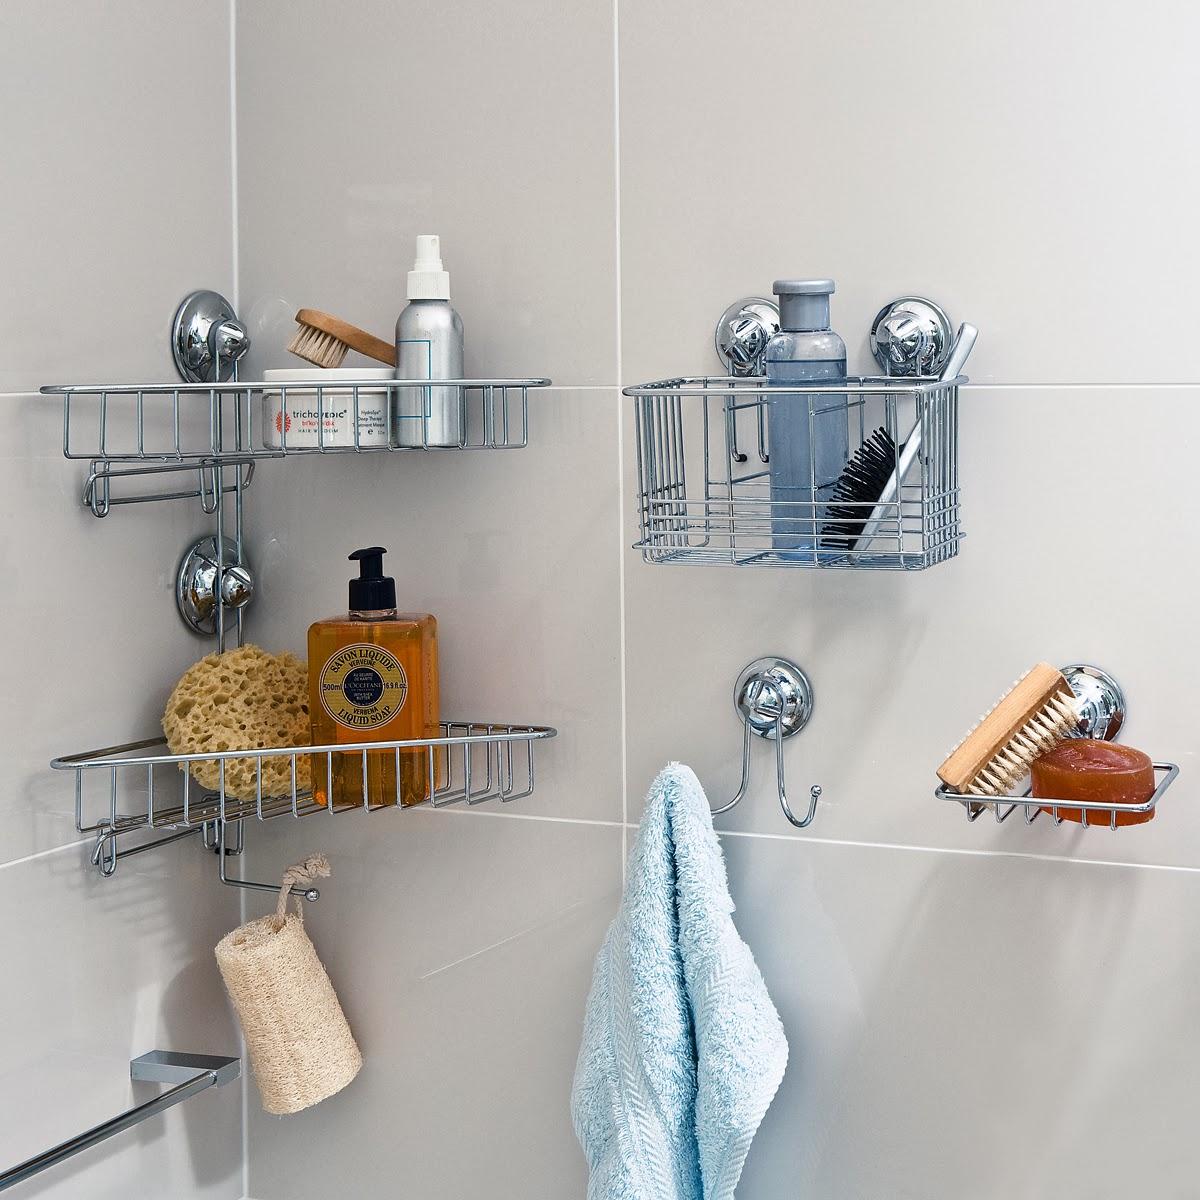 15 ideas for bathroom storage the grey home. Black Bedroom Furniture Sets. Home Design Ideas